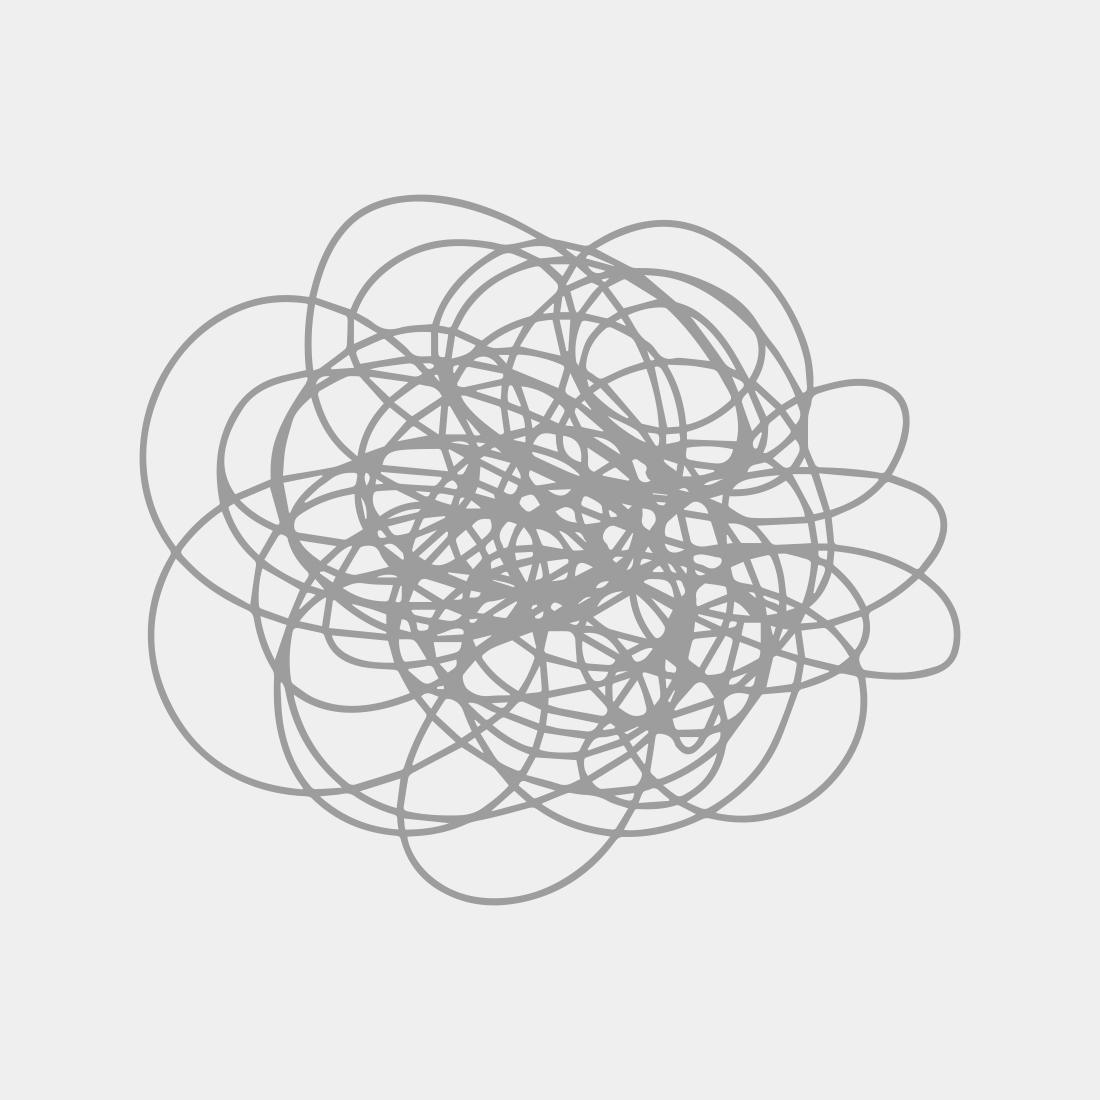 Beginners Calligraphy Workbook